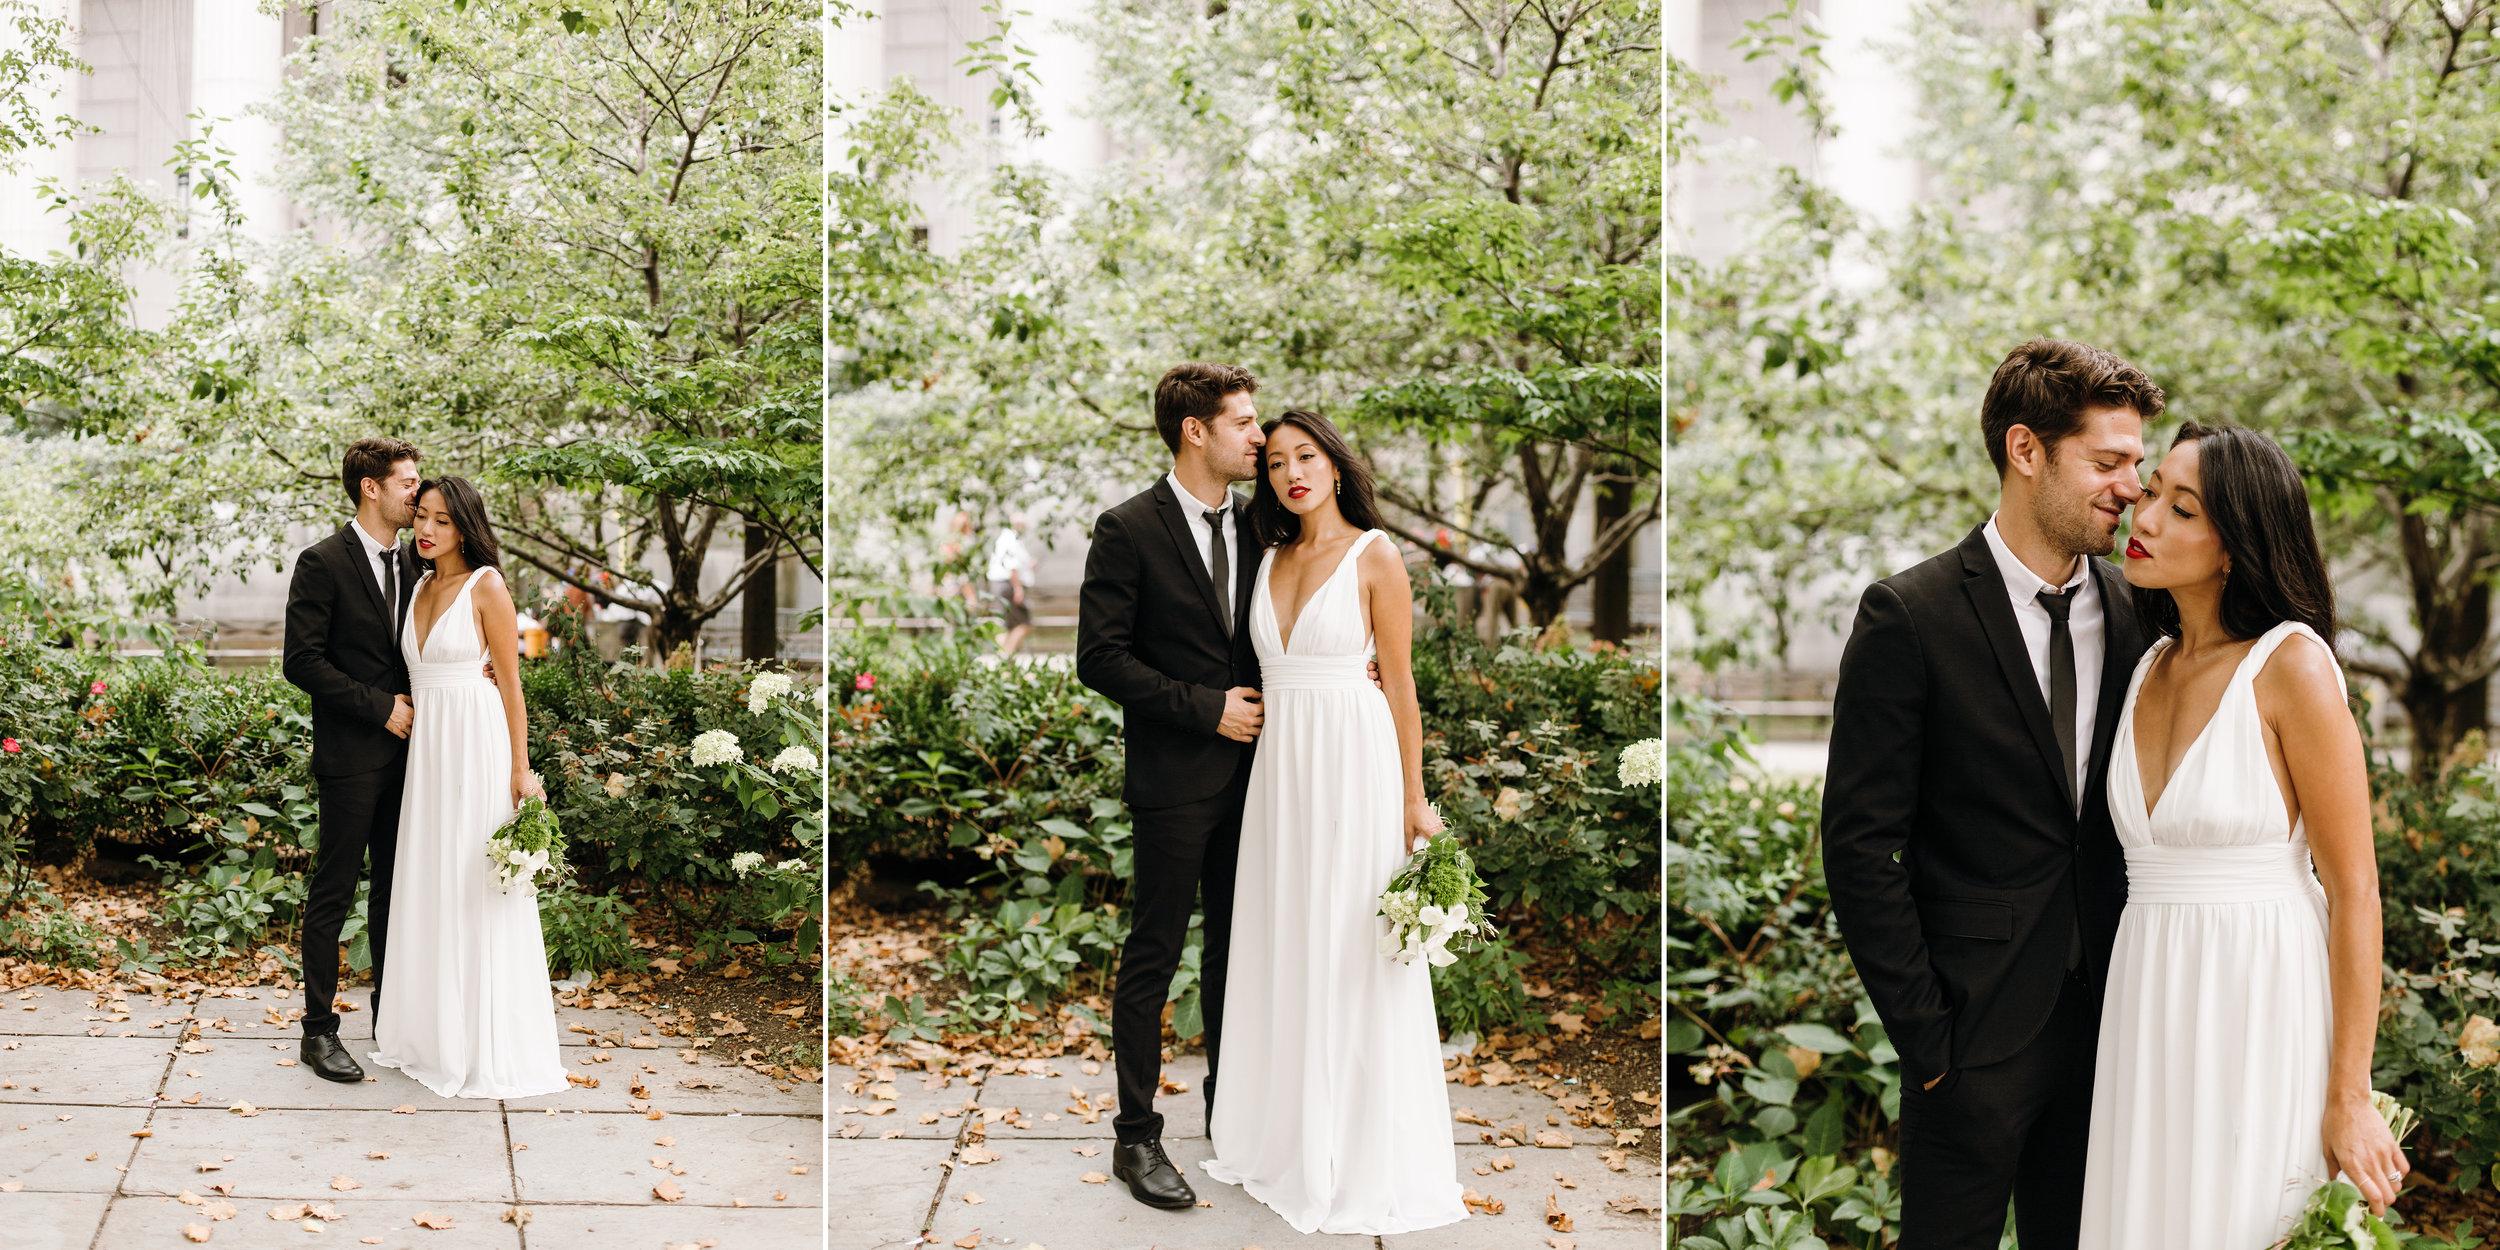 NY WEDDING PHOTOGRAPHER, NEW YORK WEDDING PHOTOGRAPHER, NEW YORK CITY WEDDING PHOTOGRAPHER, NY CITY HALL WEDDING PHOTOGRAPHER, NY ELOPEMENT PHOTOGRAPHER, NEW YORK CITY HALL ELOPEMENT PHOTOGRAPHER